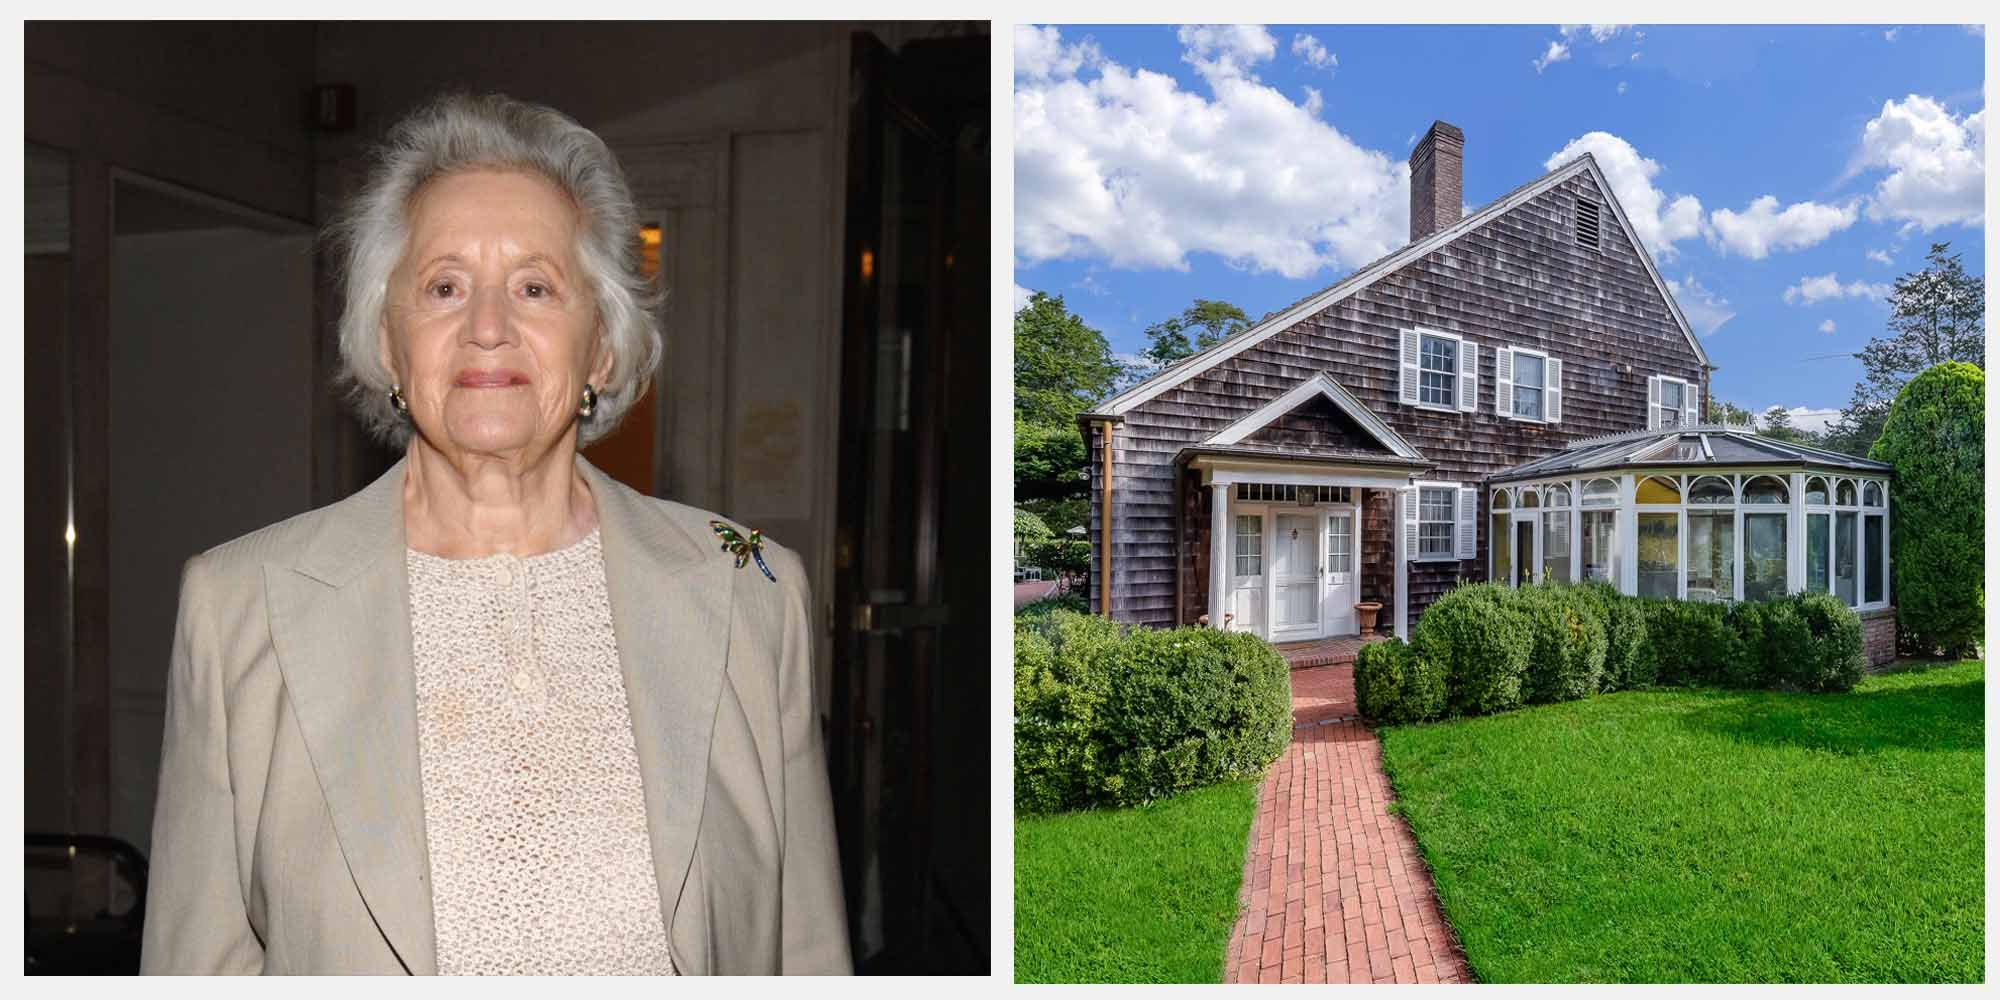 Judith Leiber's East Hampton Estate Is on the Market for $3.9 Million